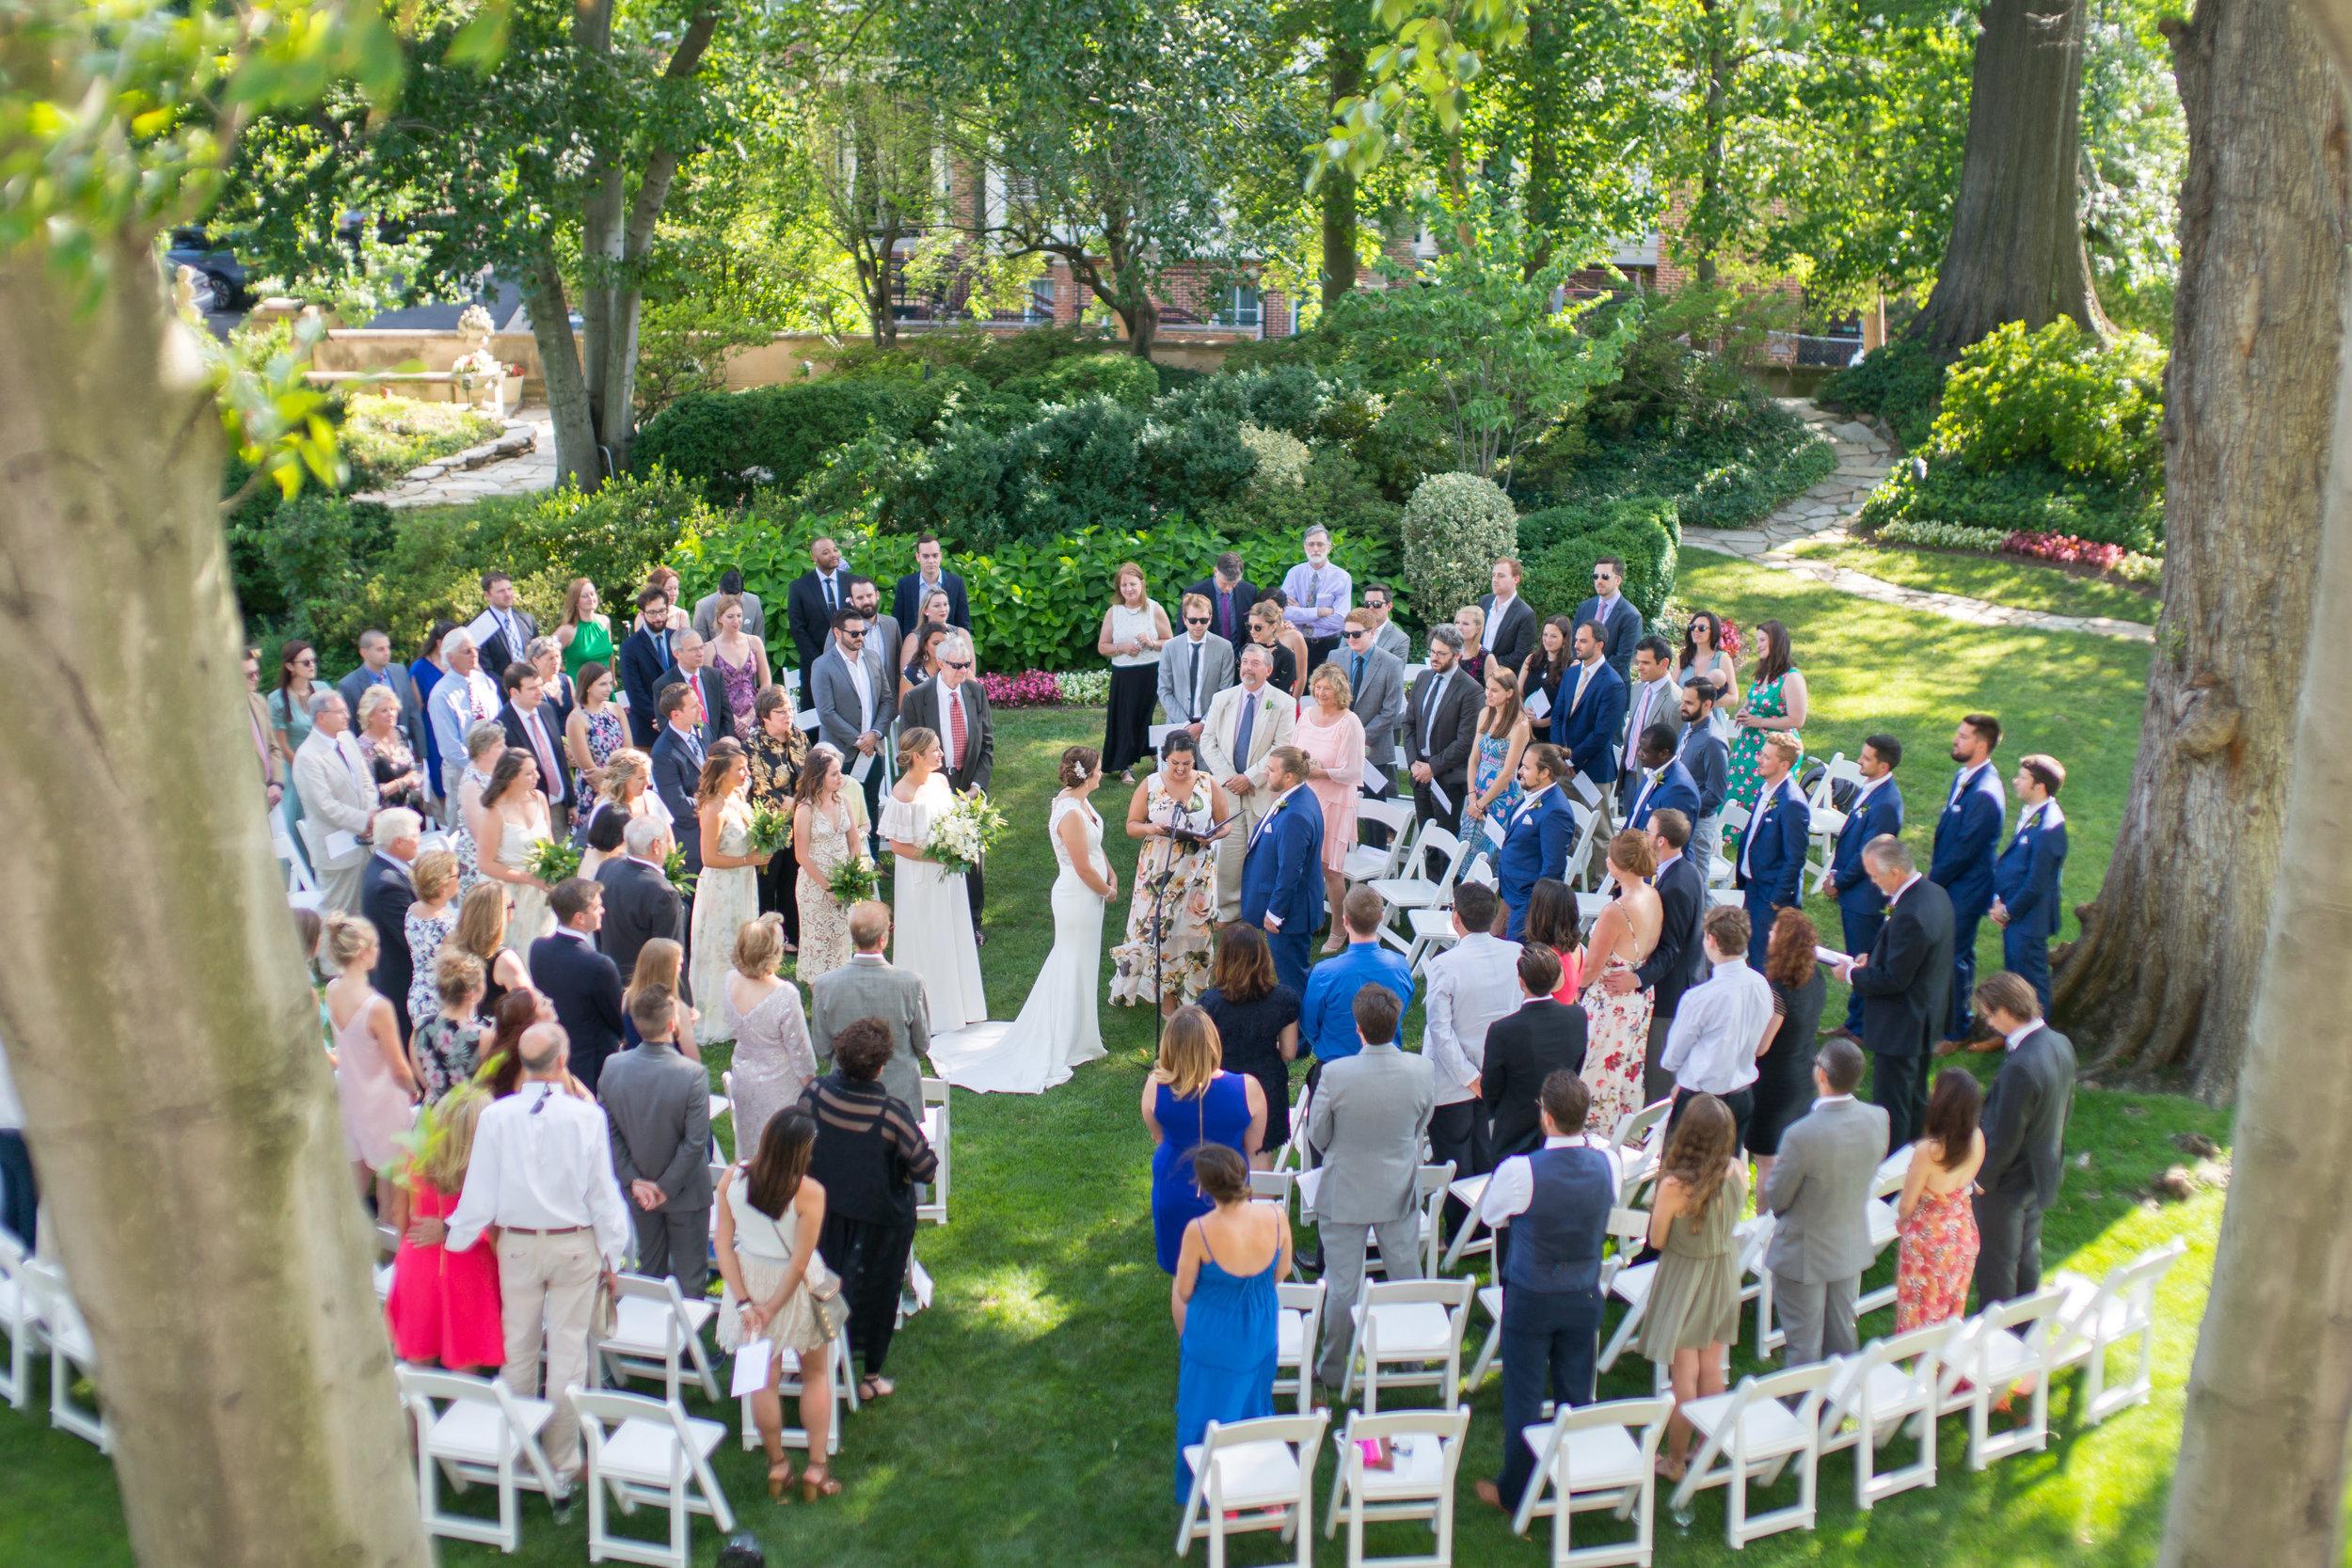 Meridian House outdoor ceremony photos summer wedding by Jessica nazarova